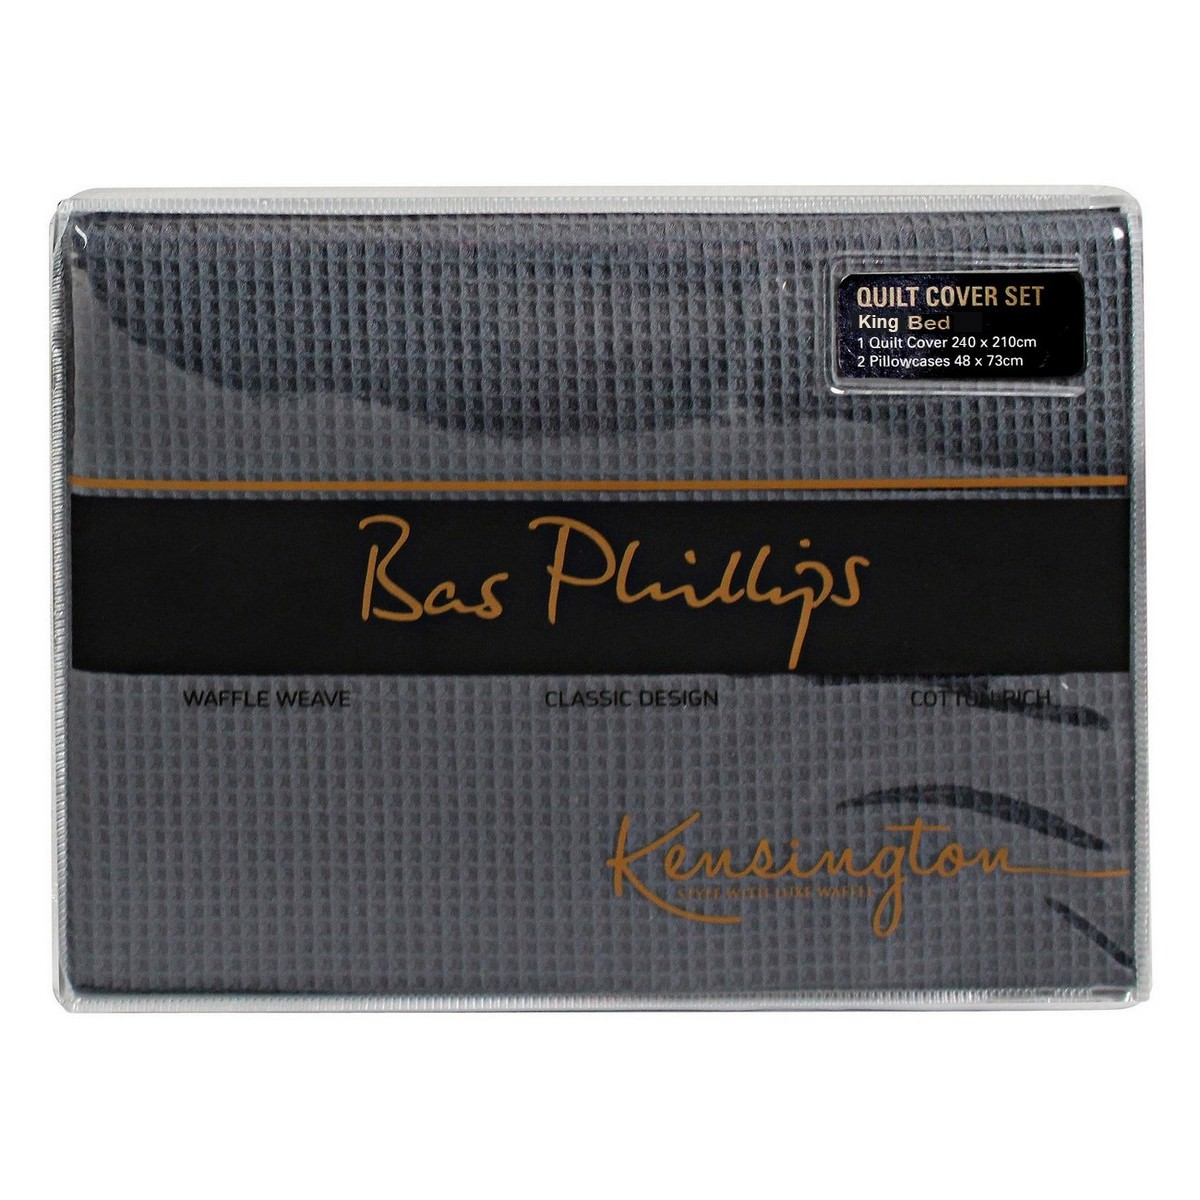 Bas Phillips Kensington Waffle Quilt Cover Set, King, Charcoal